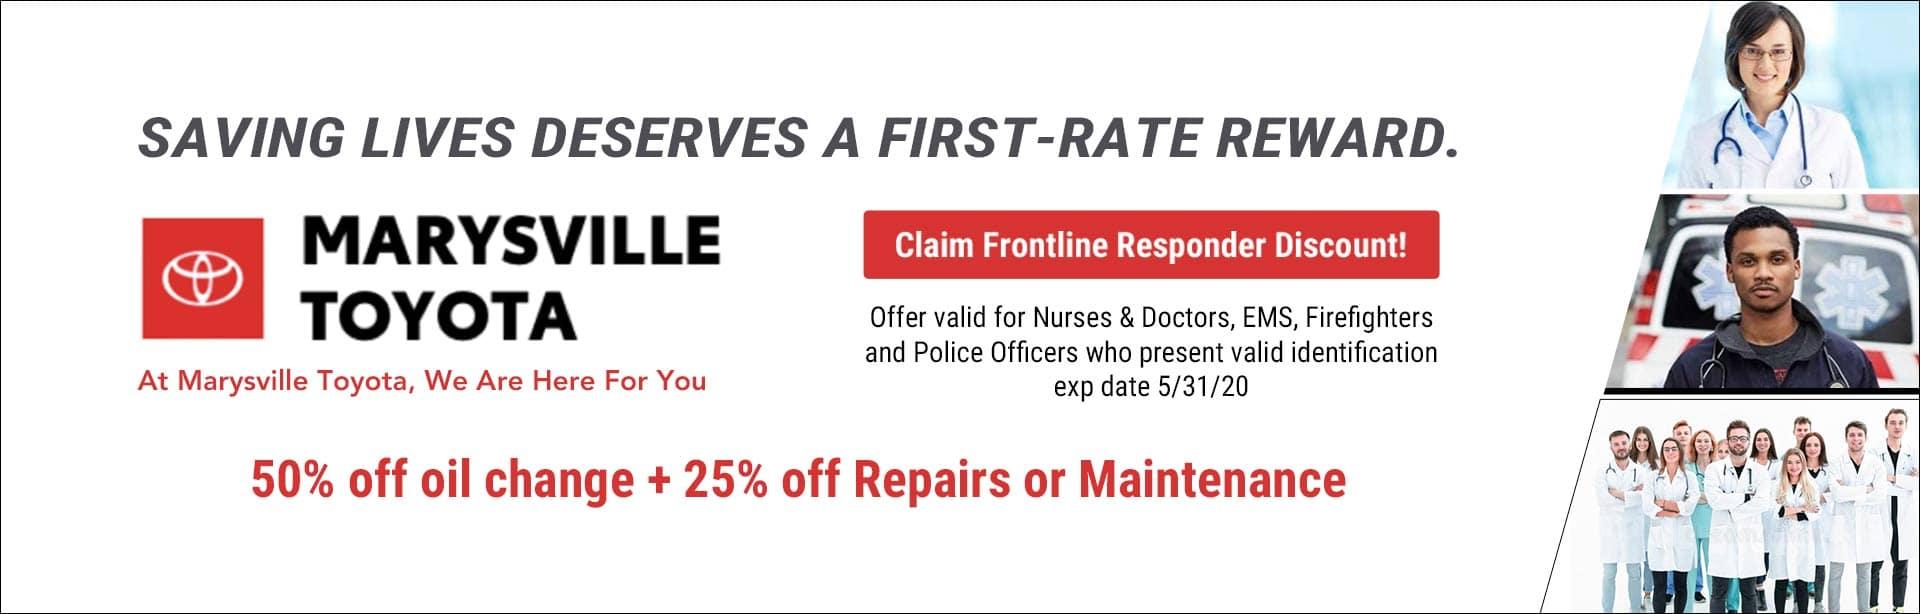 frontline responder